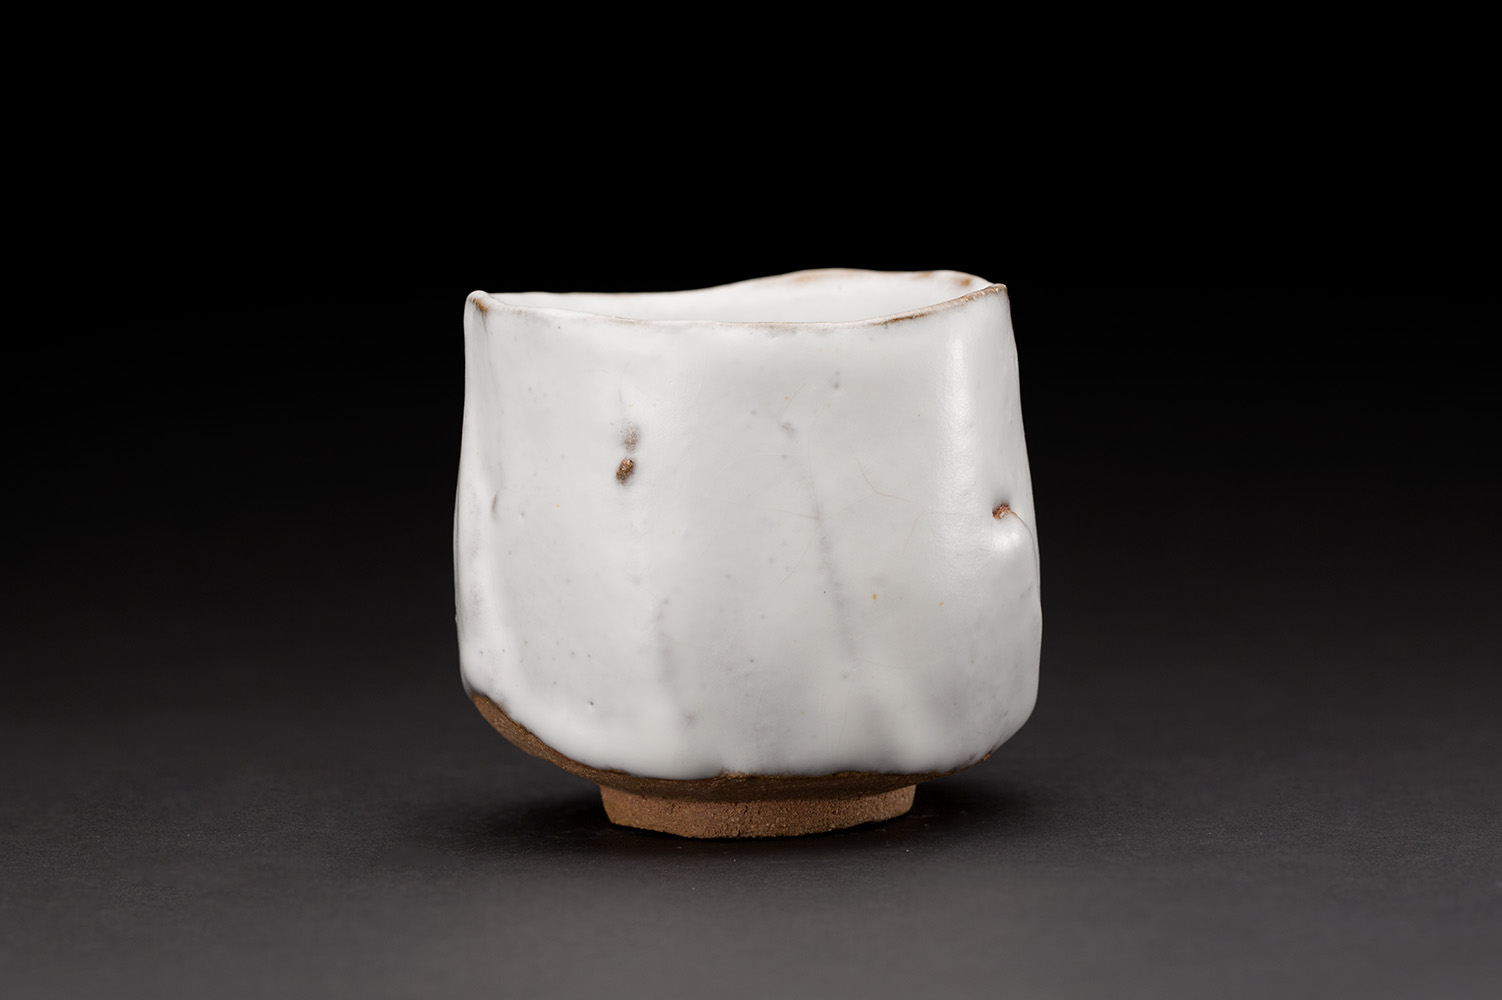 Peggy Germain  Cup  , 2018 Ceramic 2.75 x 3.25 x 3.25 inches 7 x 8.3 x 8.3 cm PGe 11